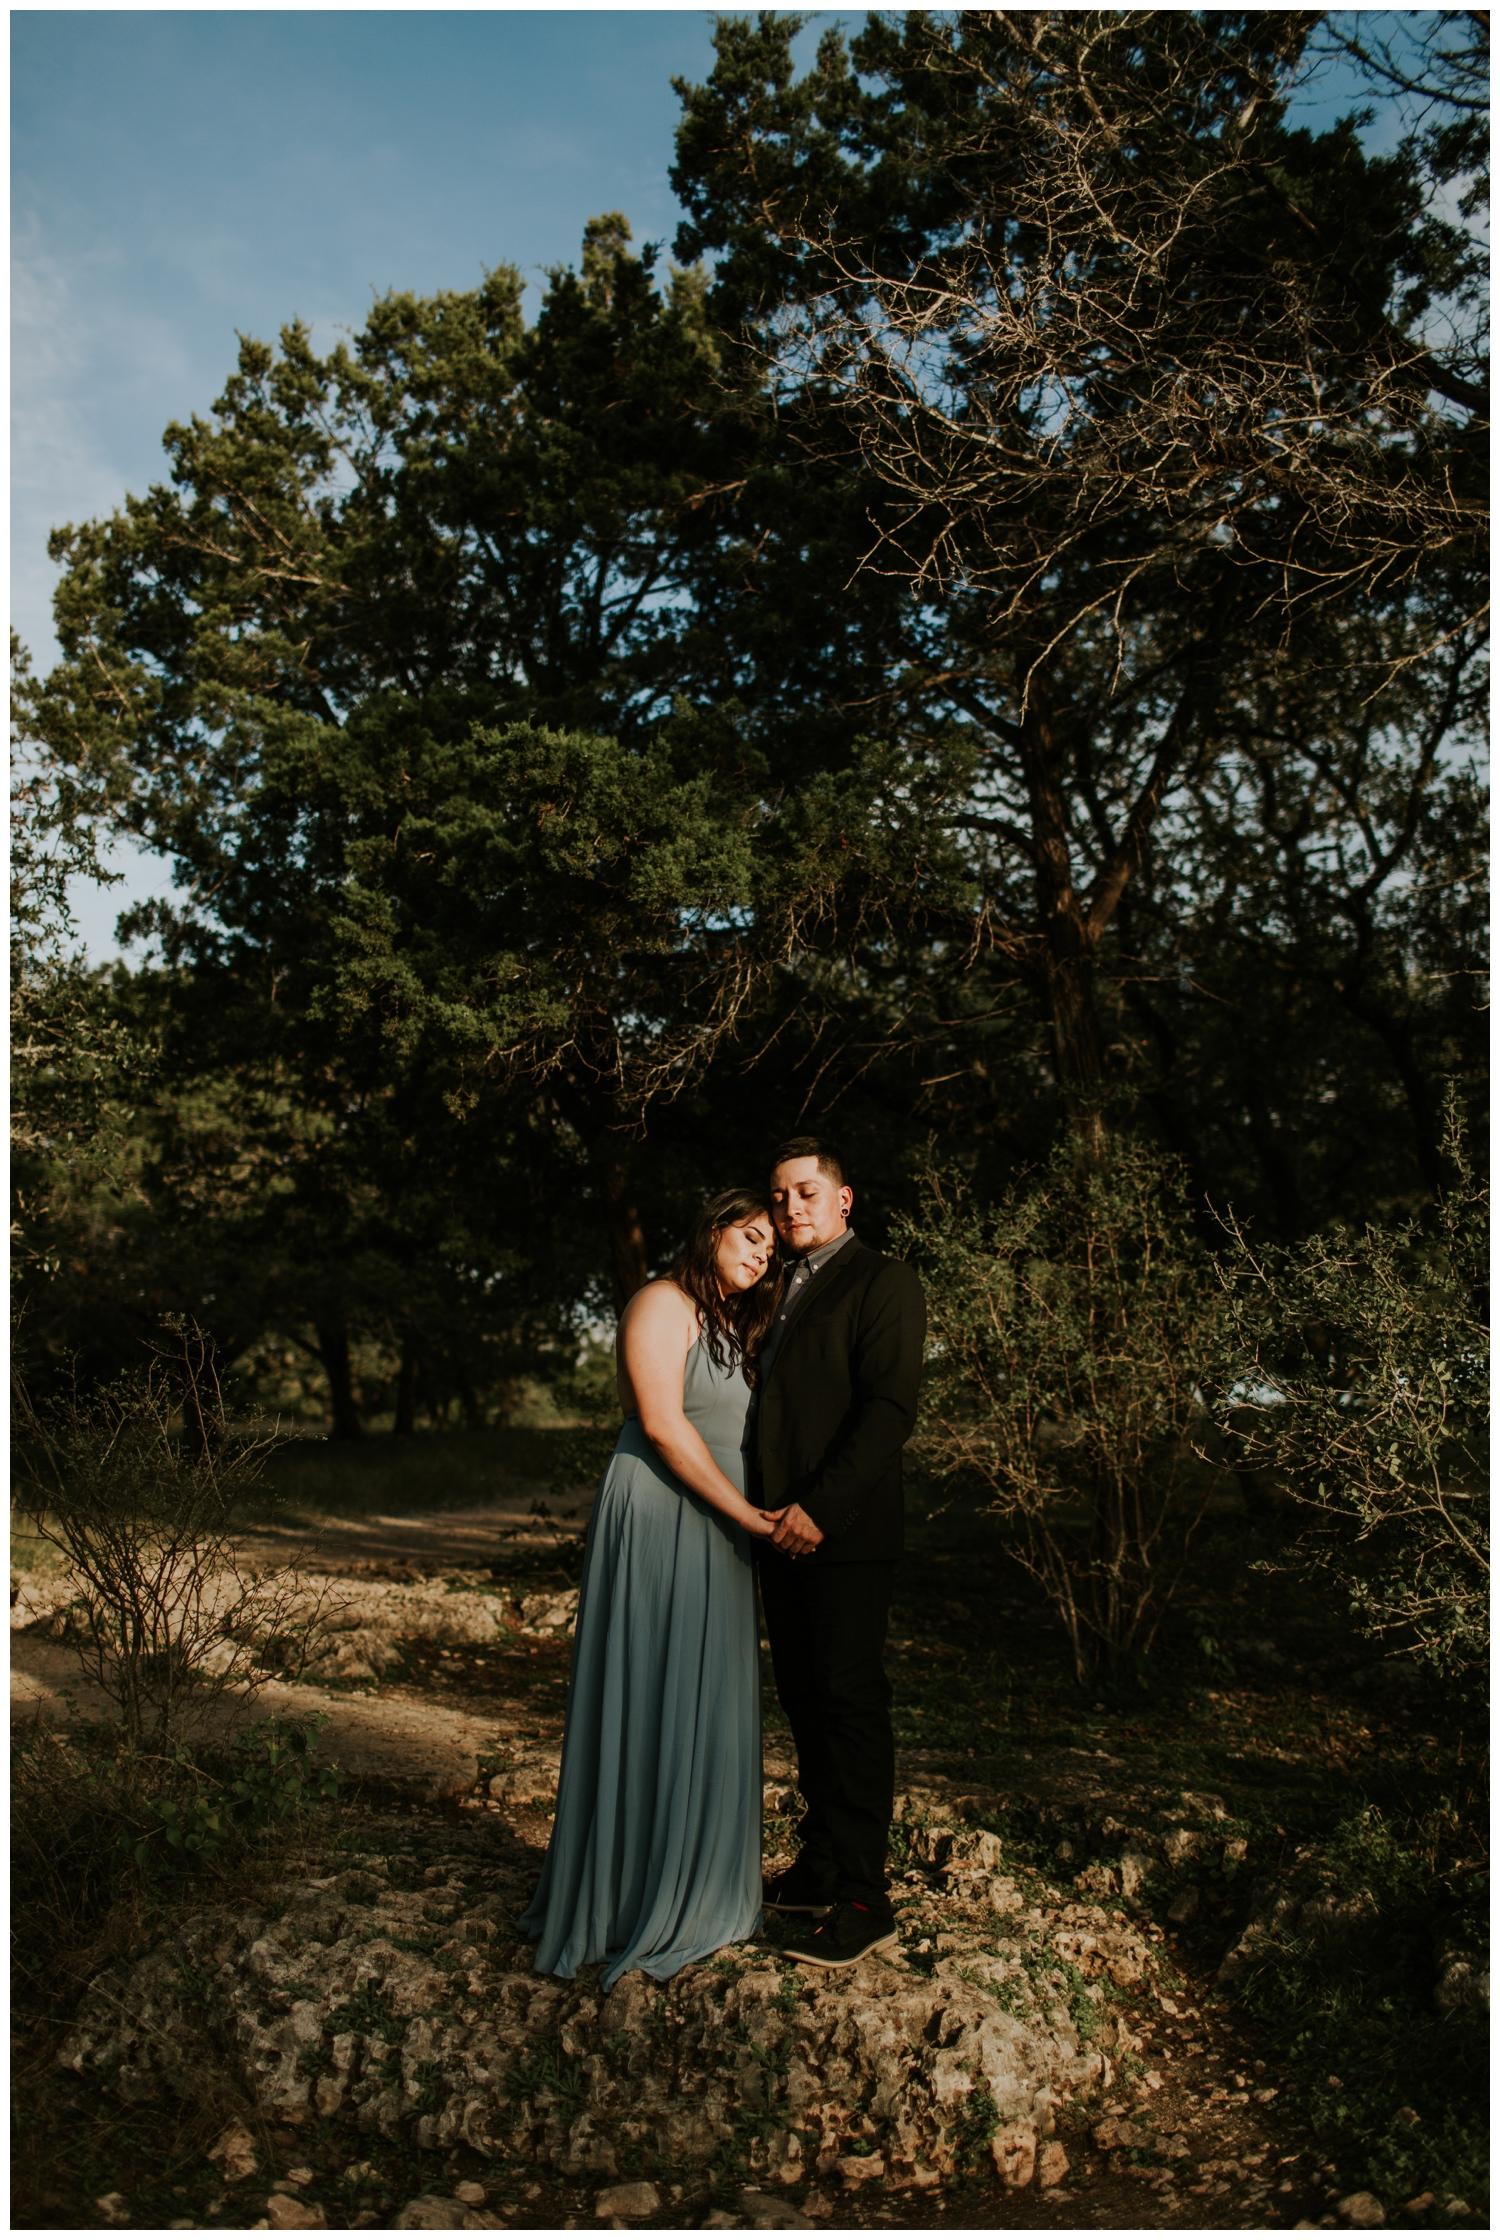 S+M, Engagement Photography Videography Canyon Lake, Texas_0031.jpg